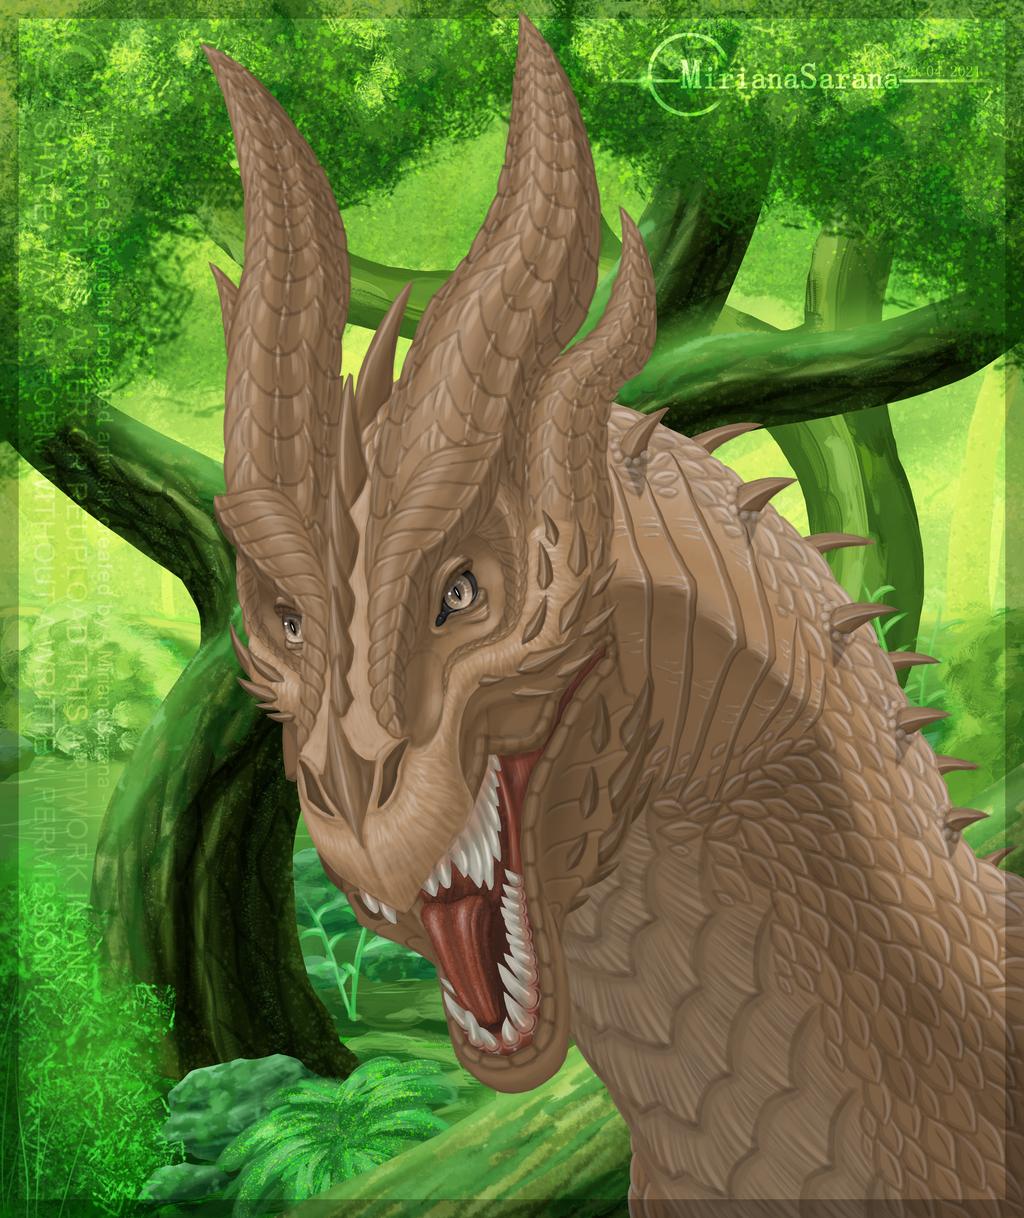 Most recent image: MirianaSarana - Fantasy - Dragon